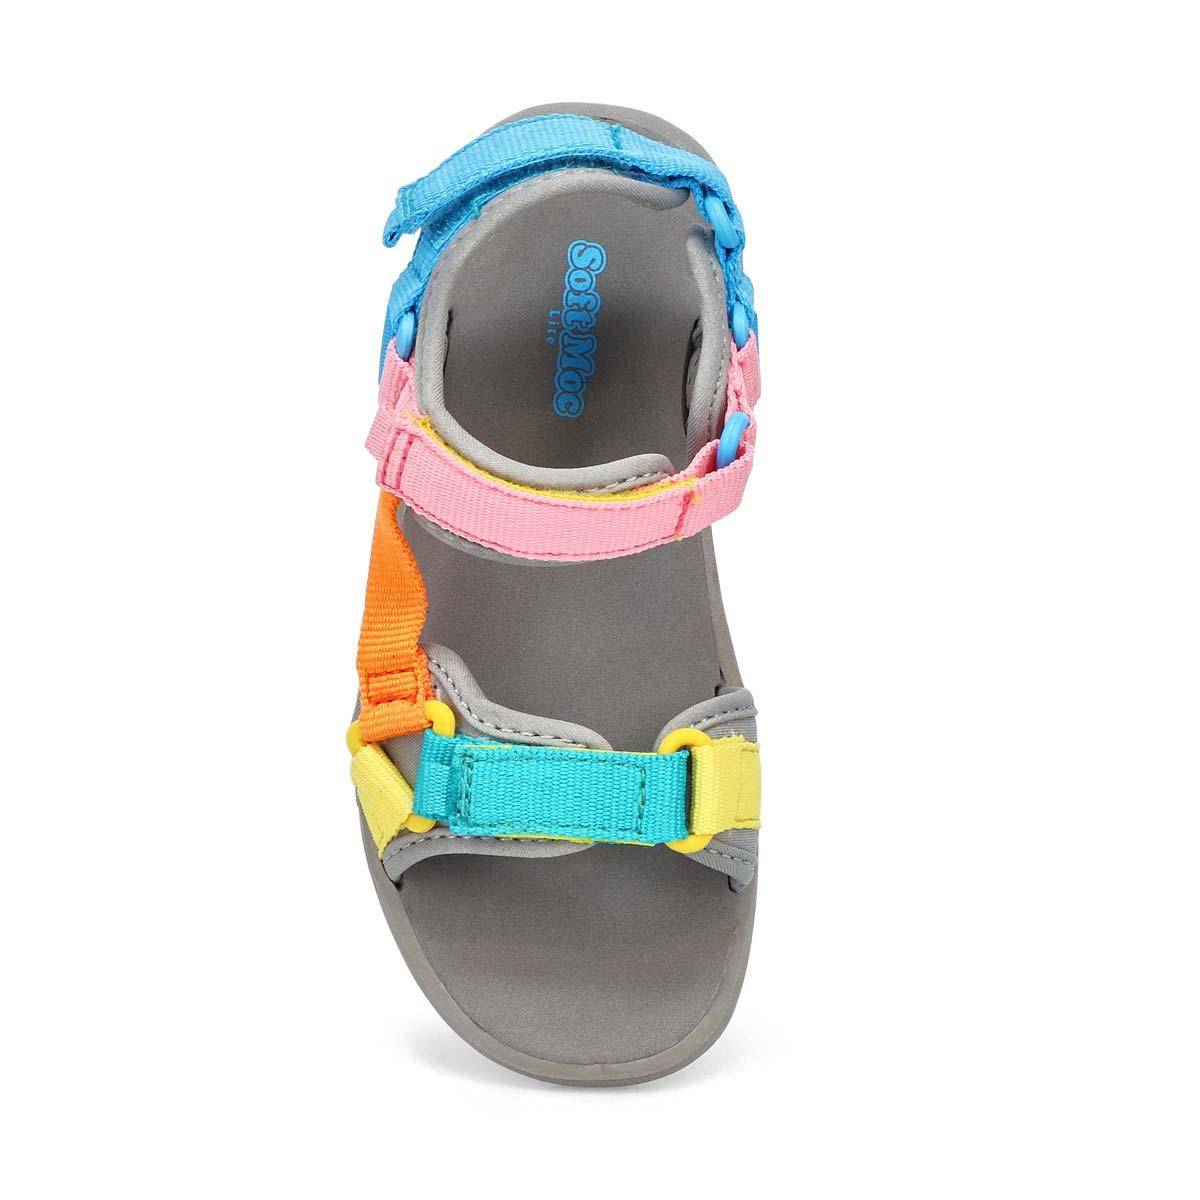 Girls' Lacy Sport Sandal - Multi